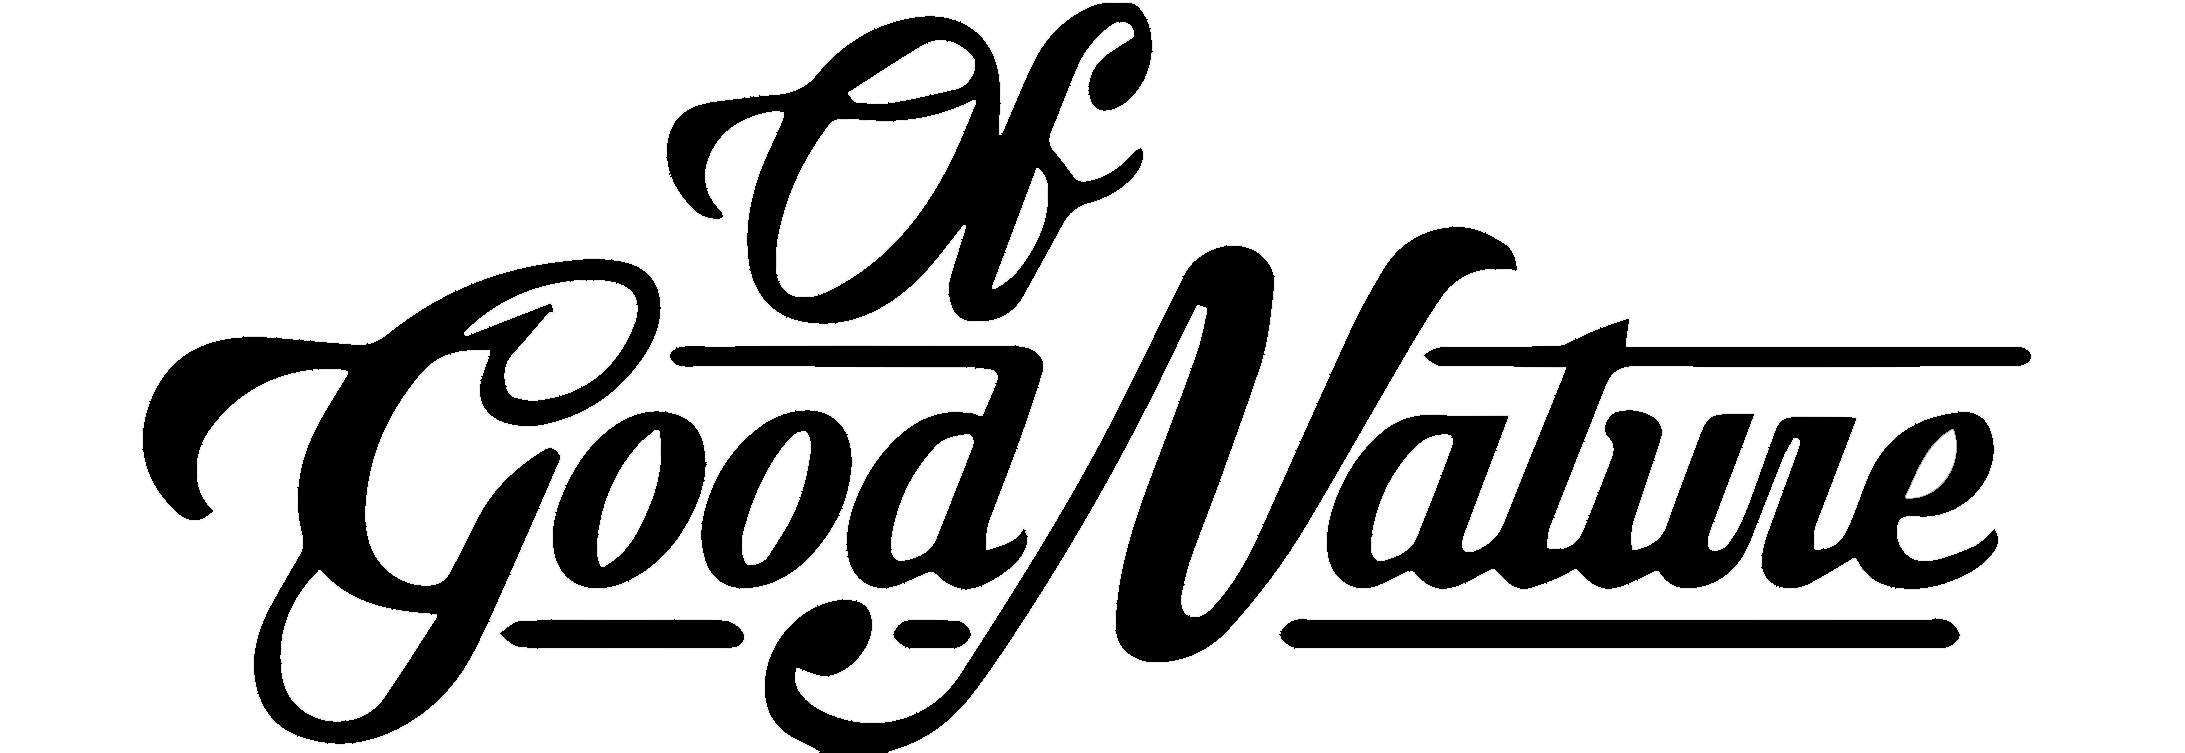 18905OGN_White_Script_Logo.png